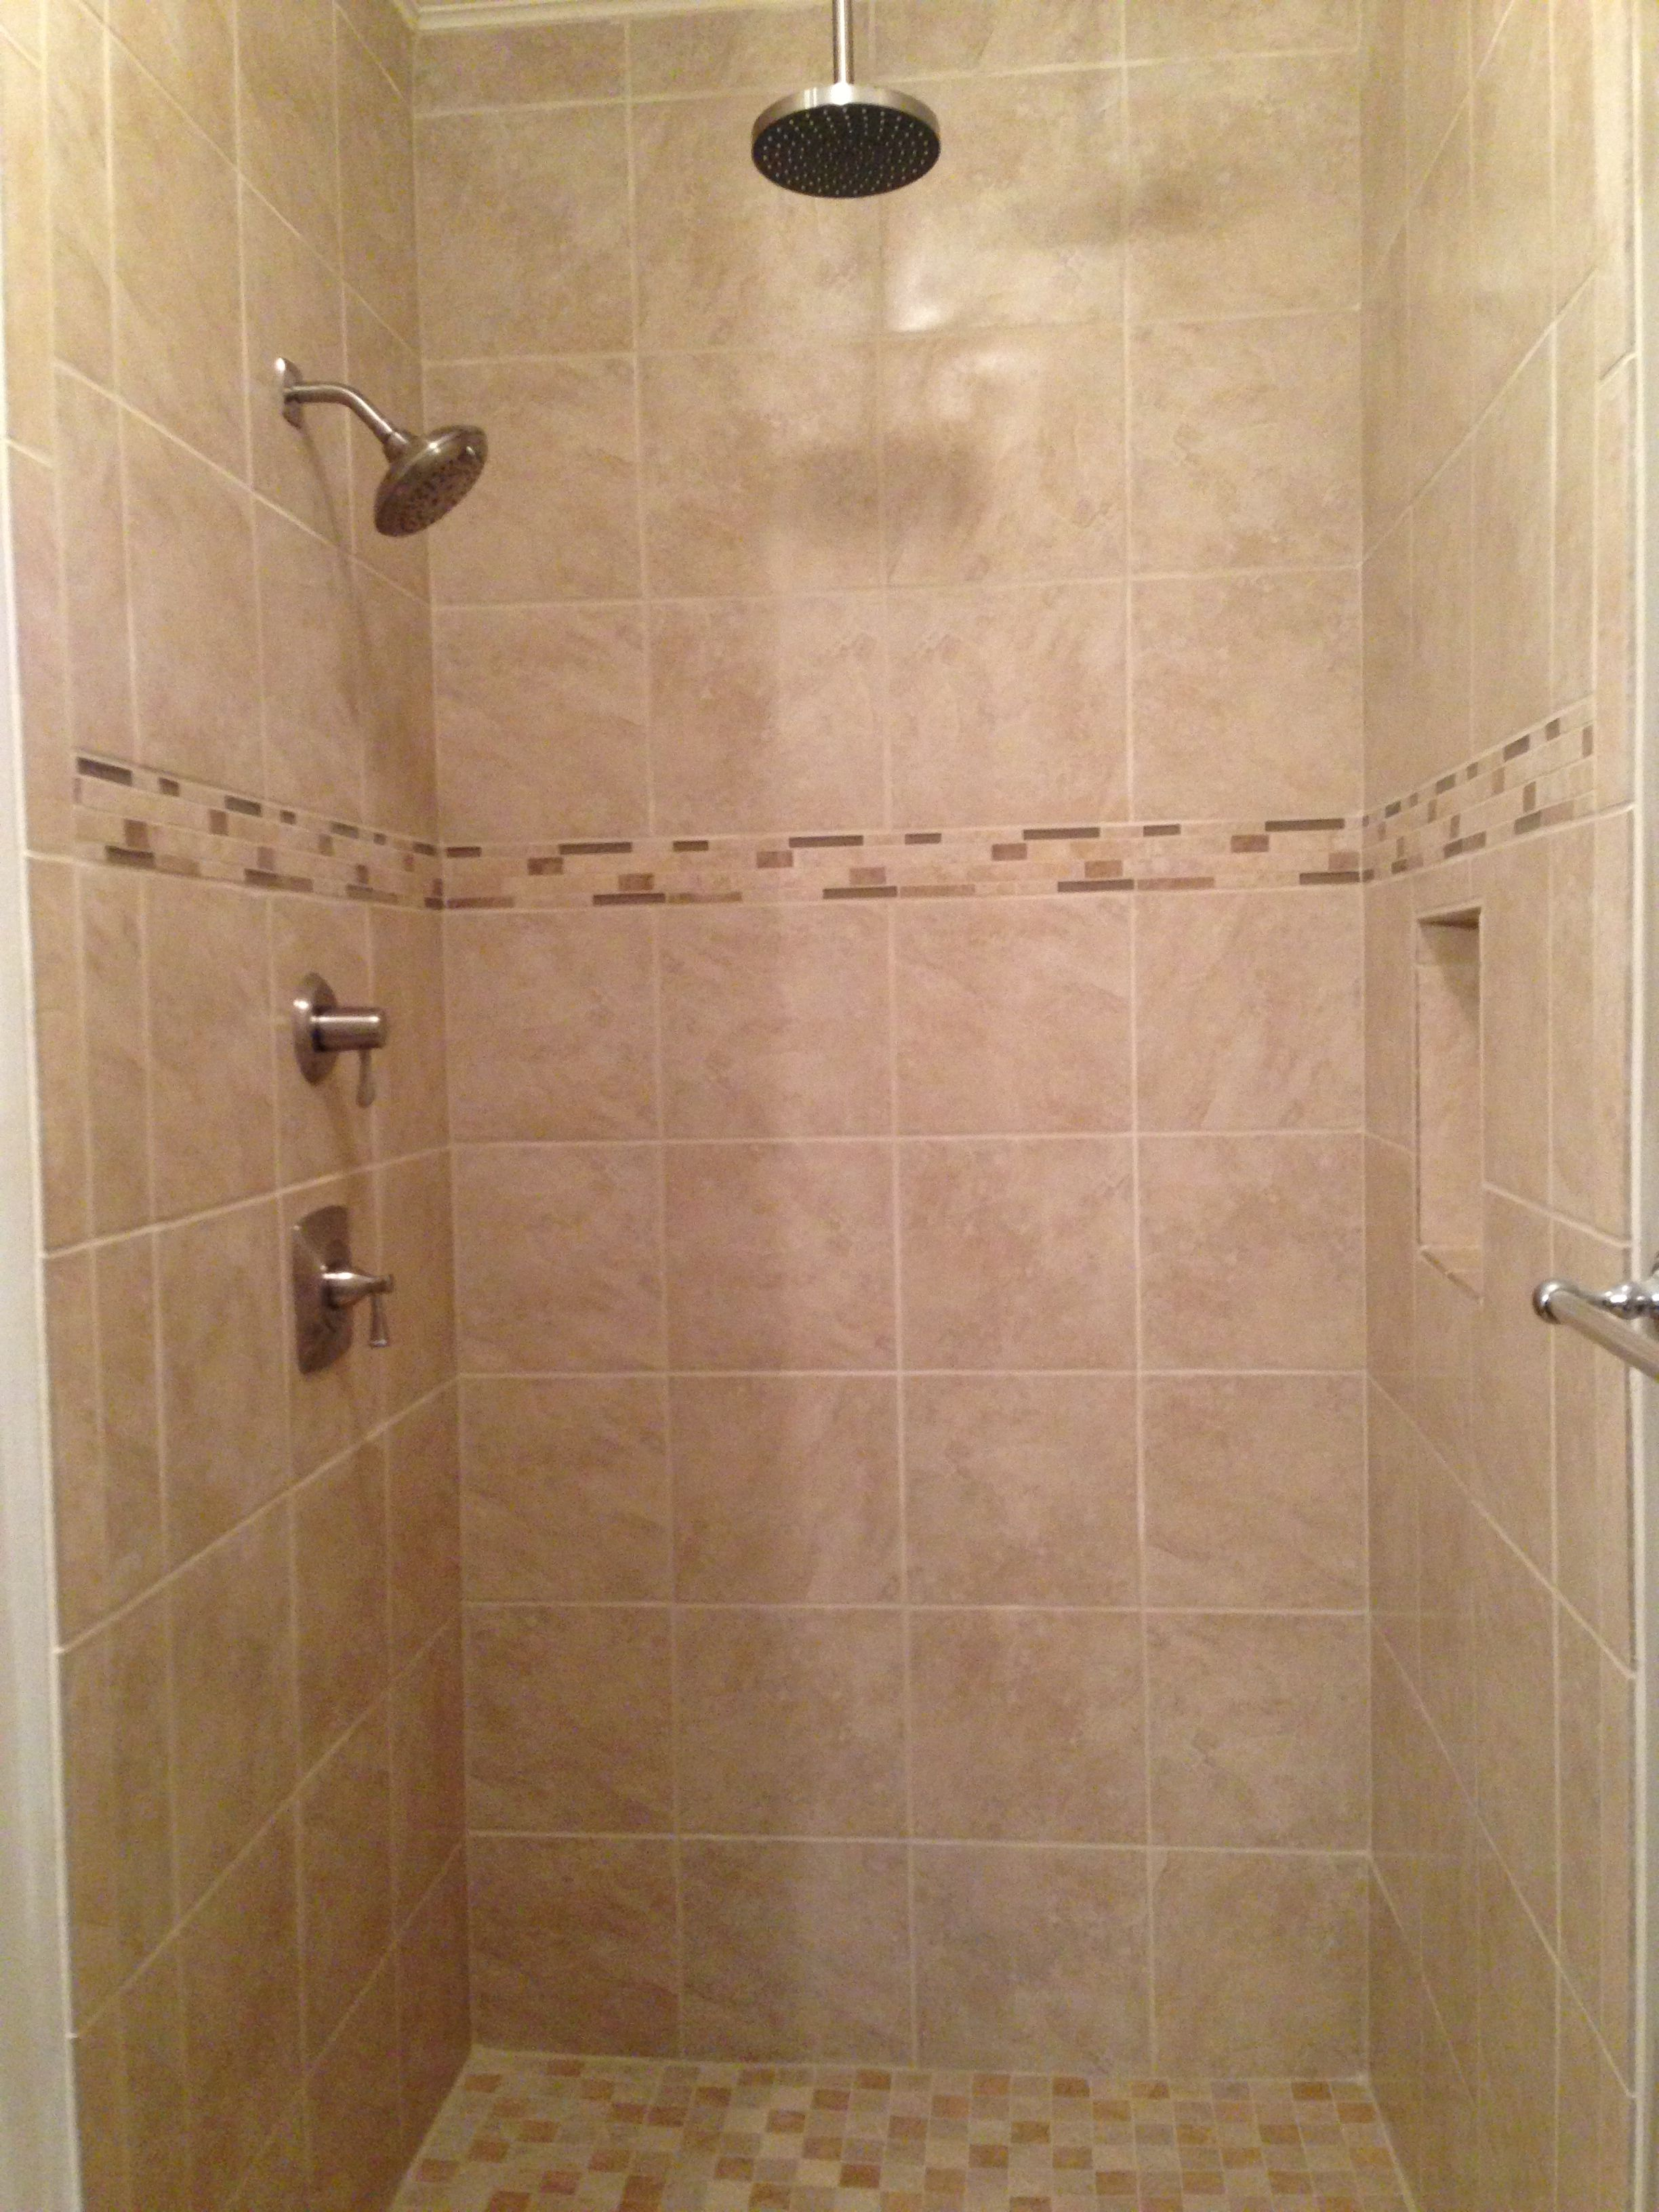 Light beige tile shower with rain head shower fixture. Beige tile ...